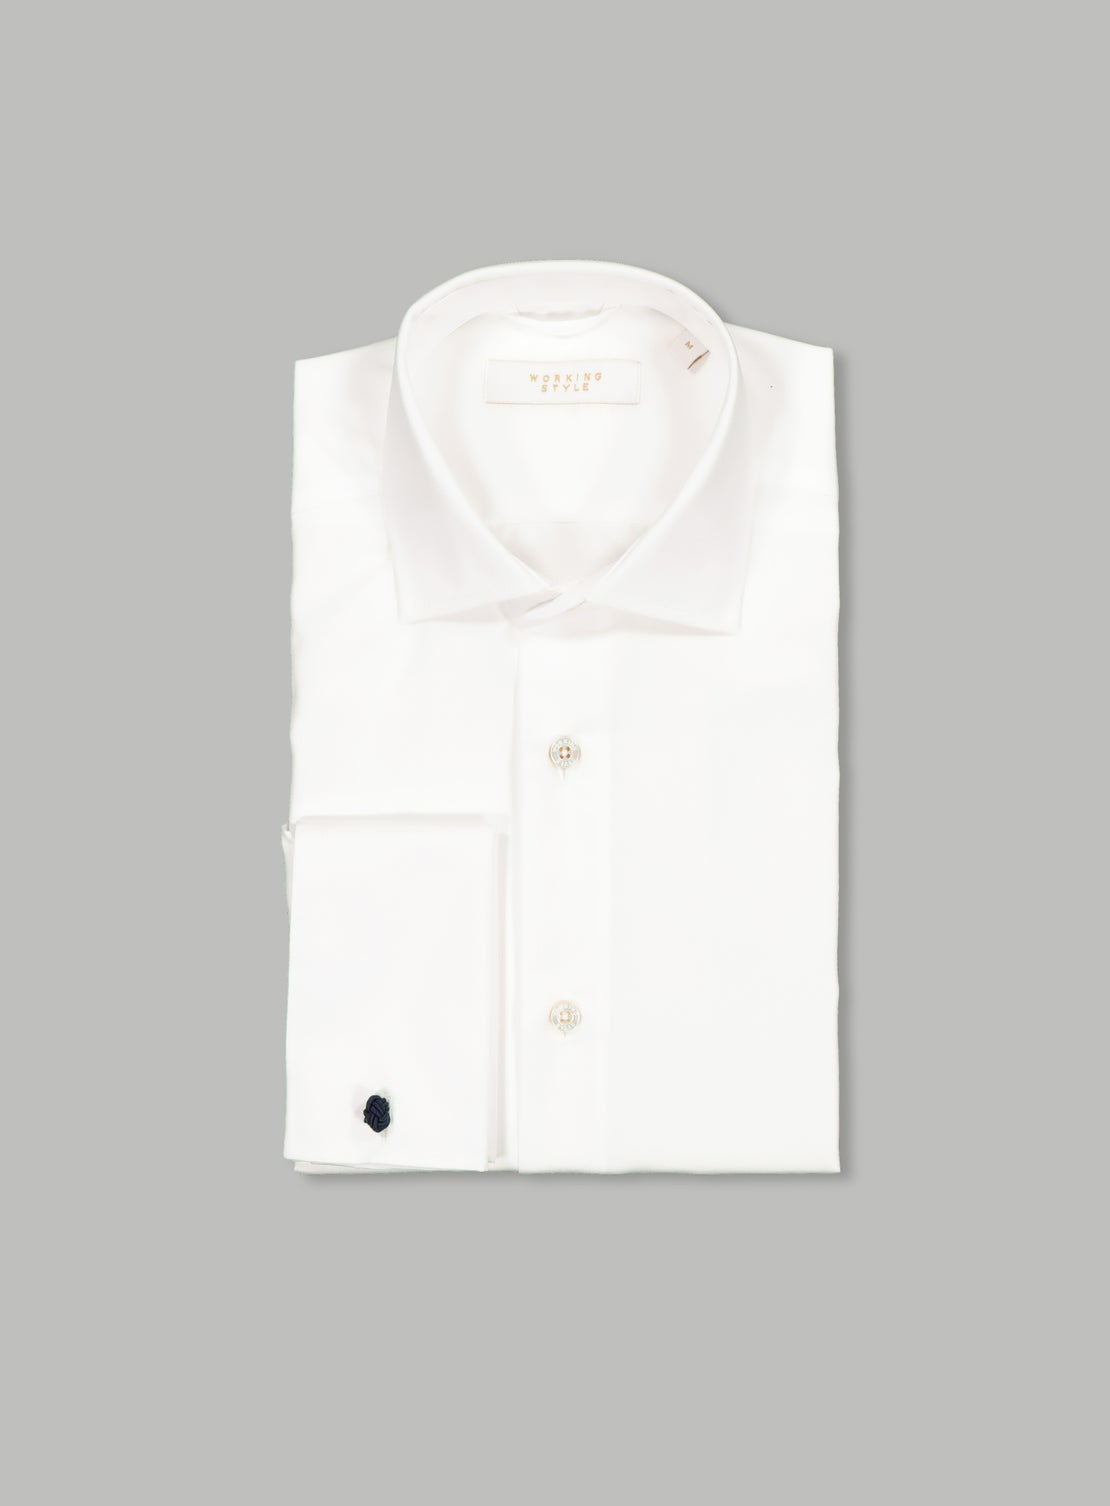 *White Poplin Double Shirt